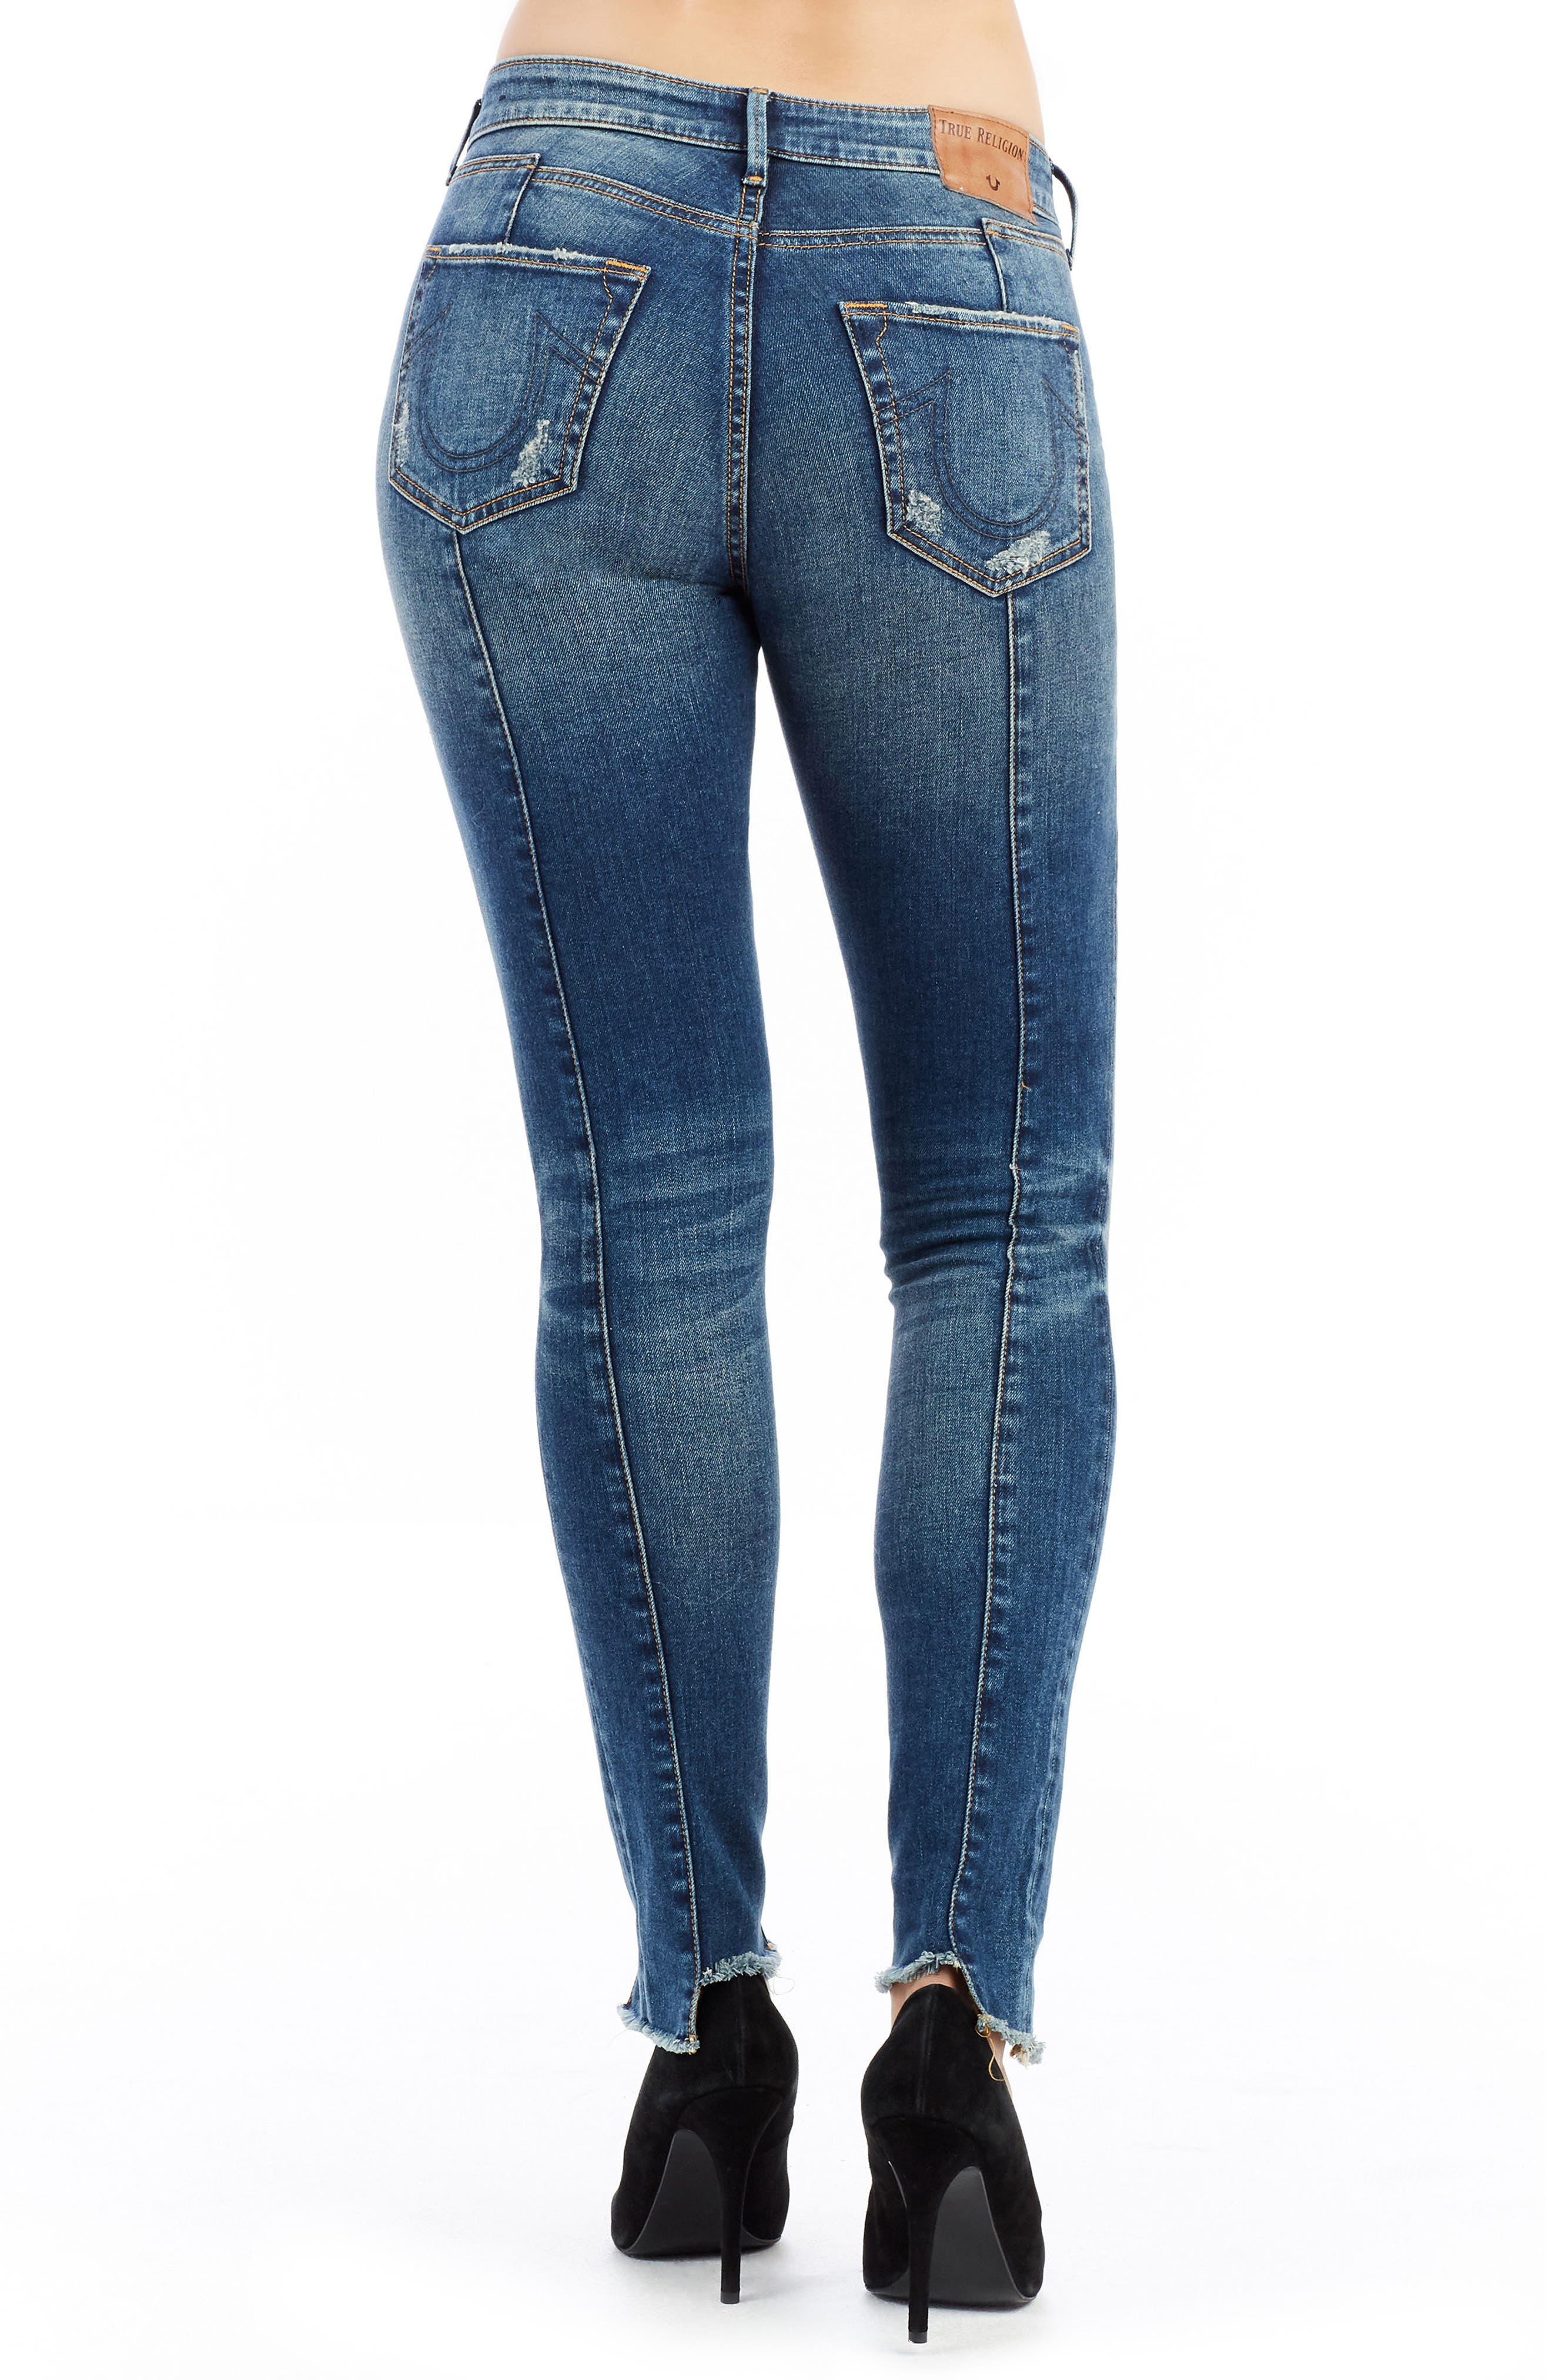 Jennie Curvy Skinny Jeans,                             Alternate thumbnail 2, color,                             Famous Blue Rock